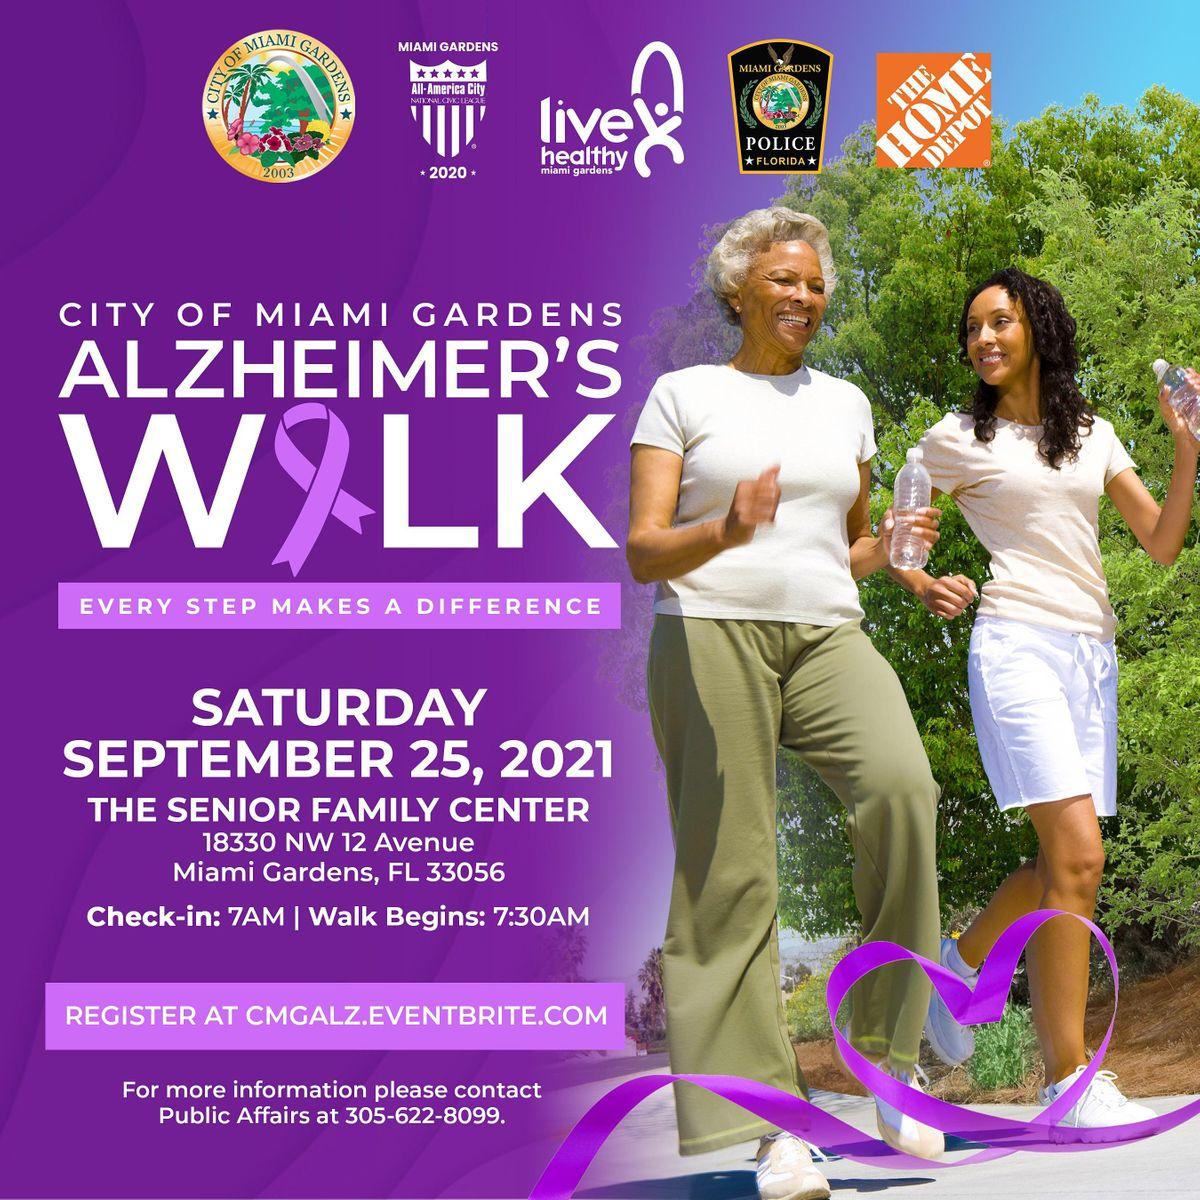 City of Miami Gardens Alzheimer's Walk